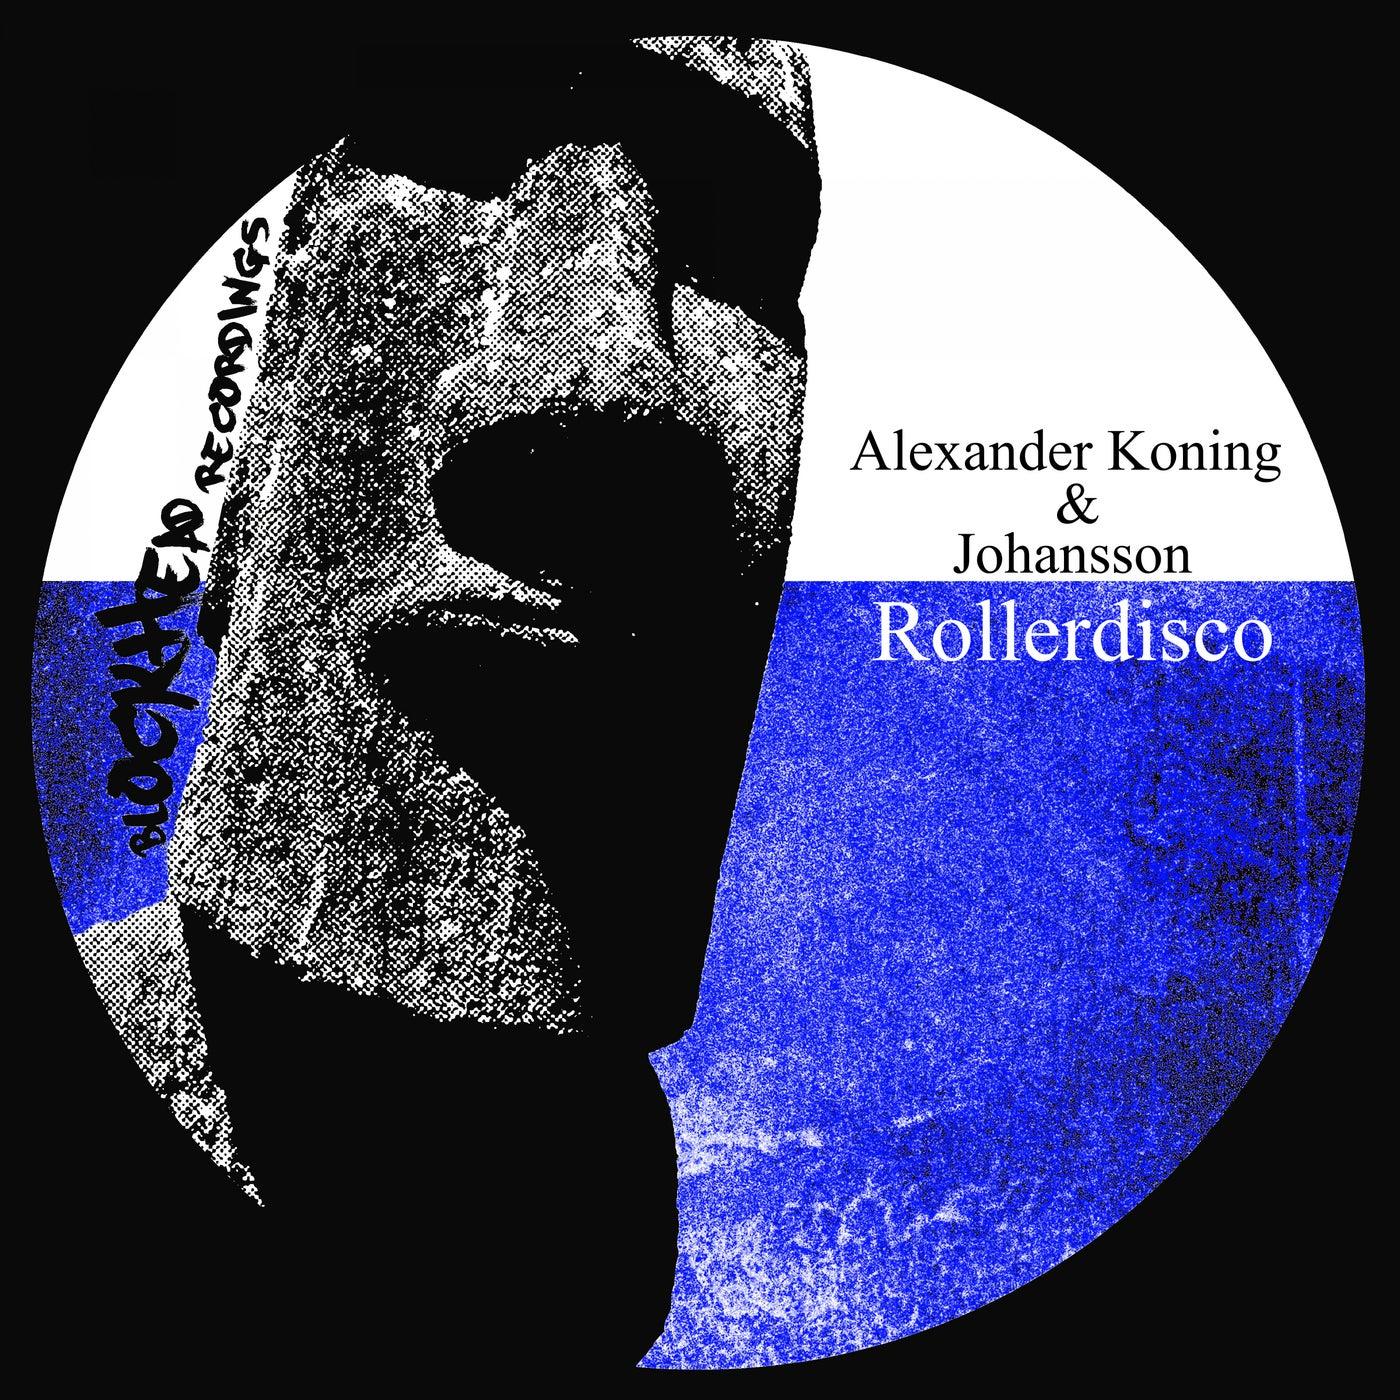 Alexander Koning & Johansson Rollerdisco